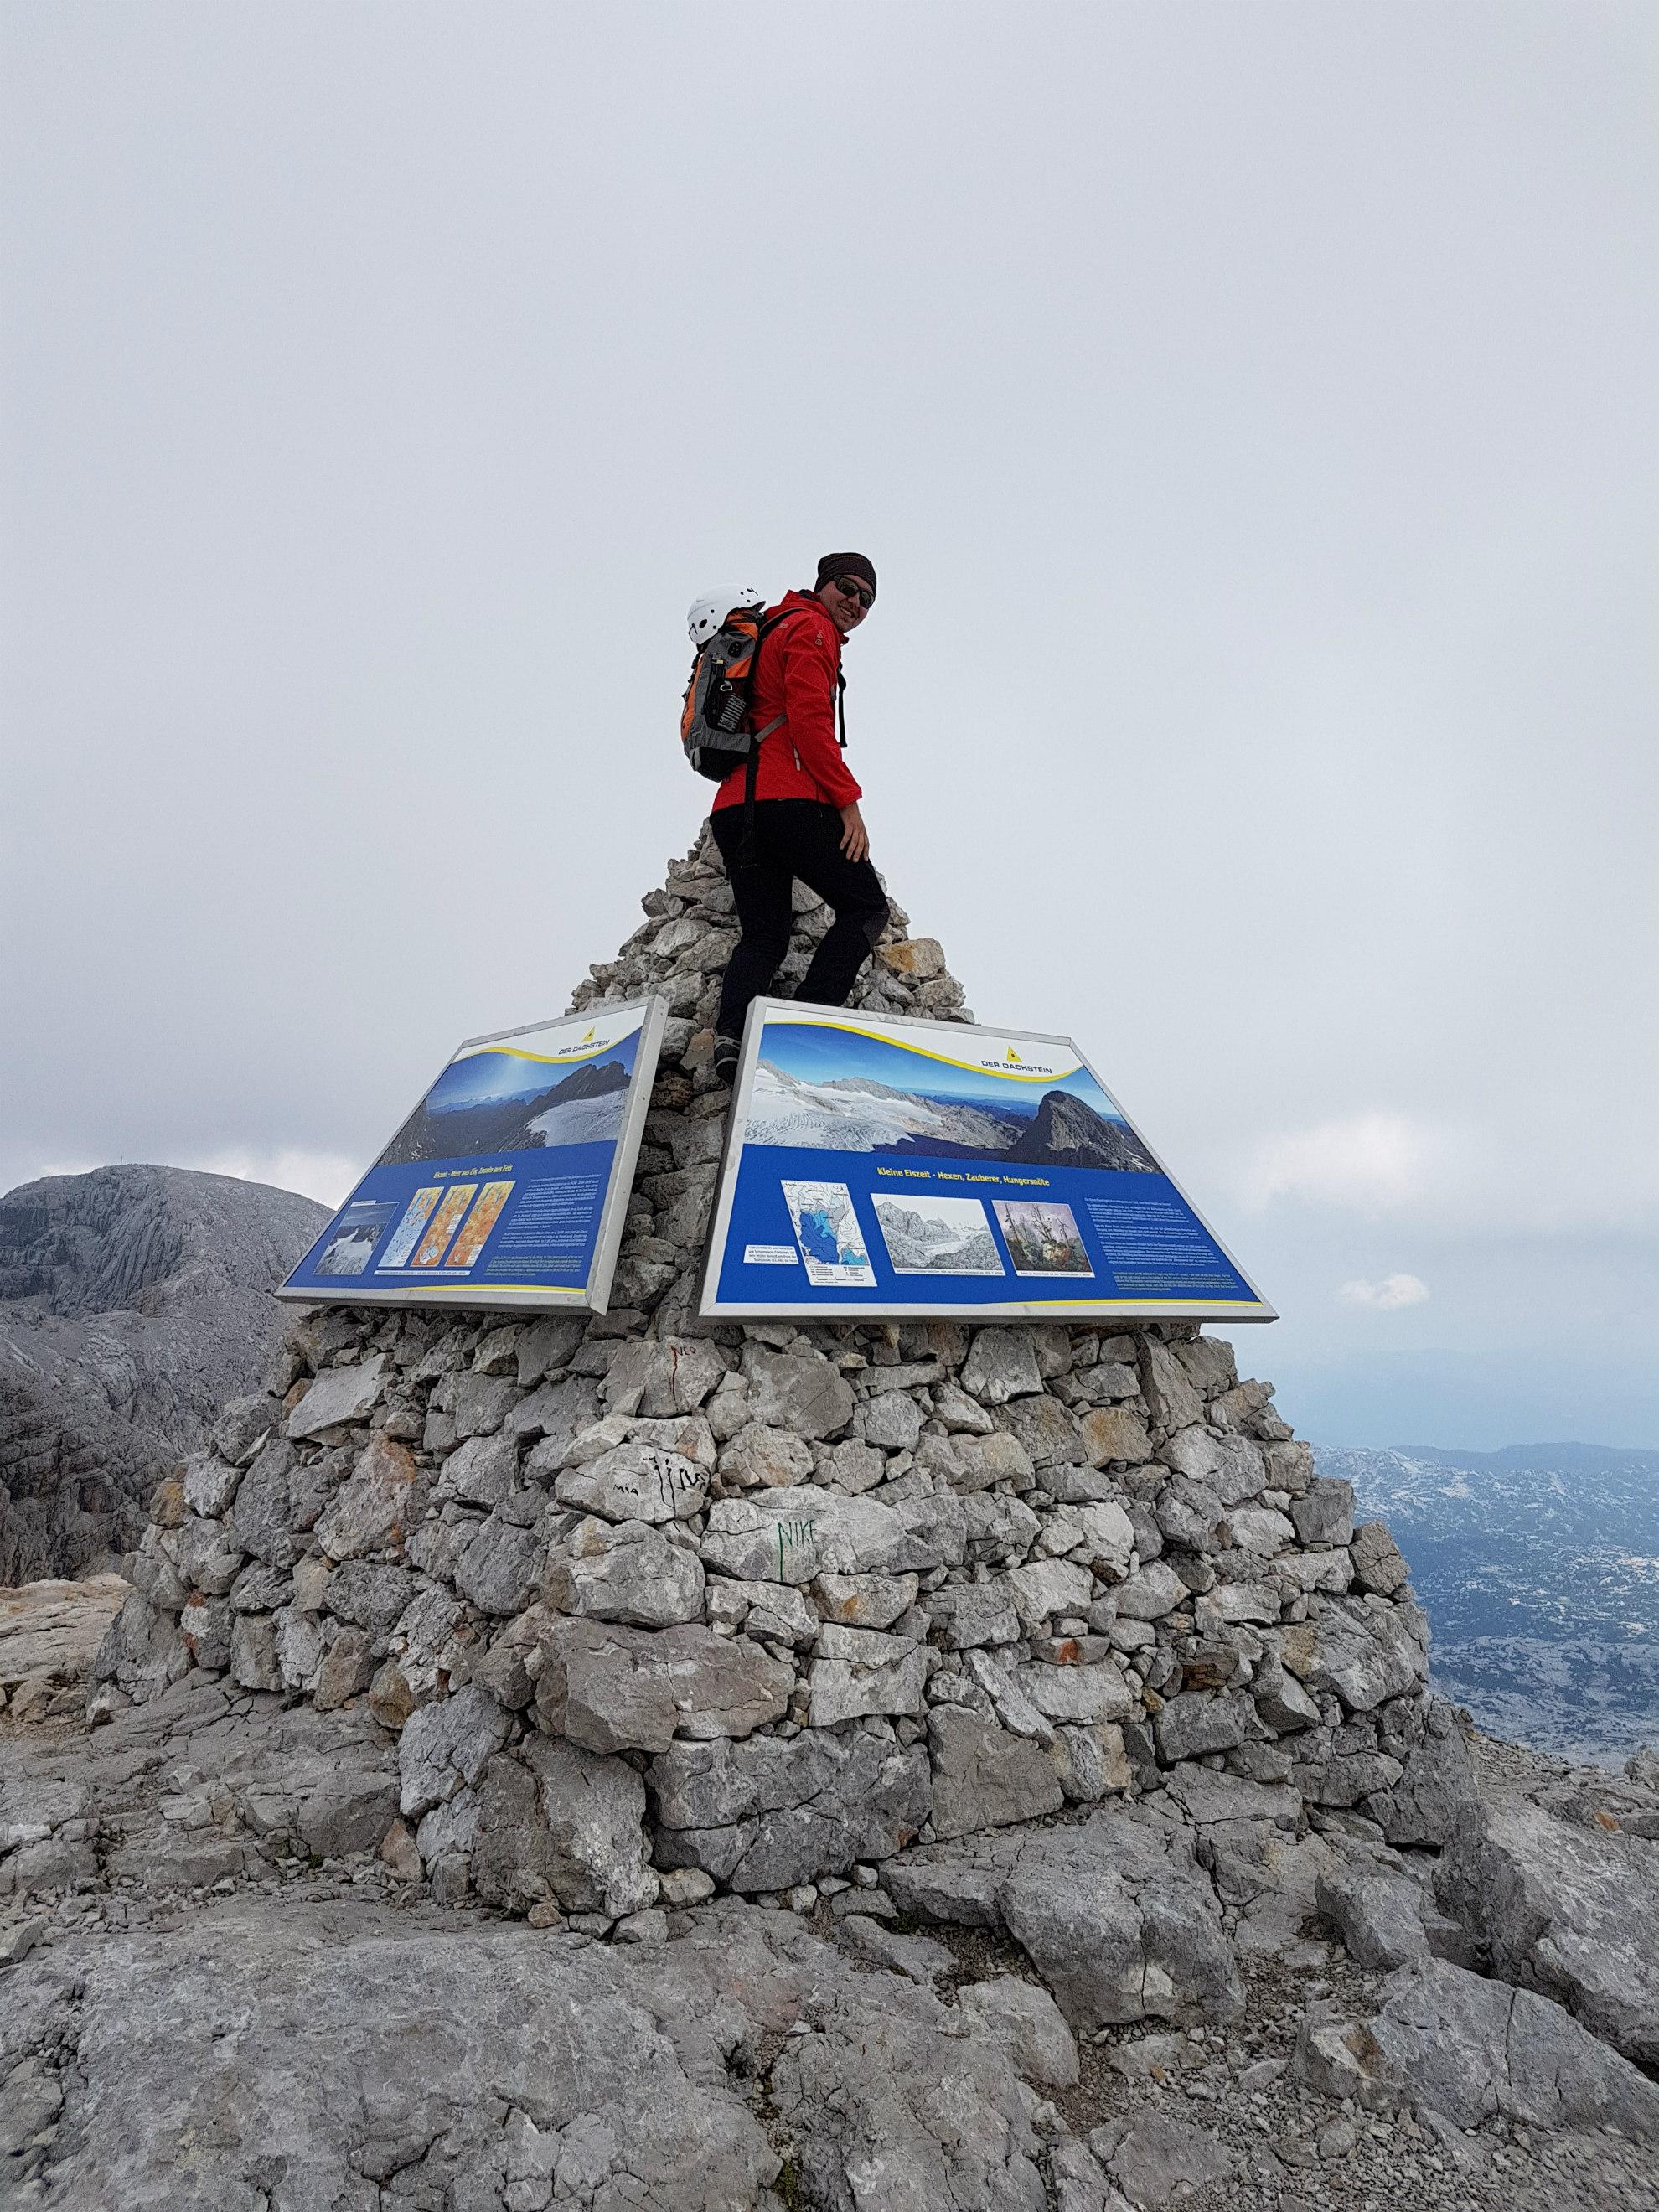 gjaidstein-pyramida-vrchol-rakuske-alpy